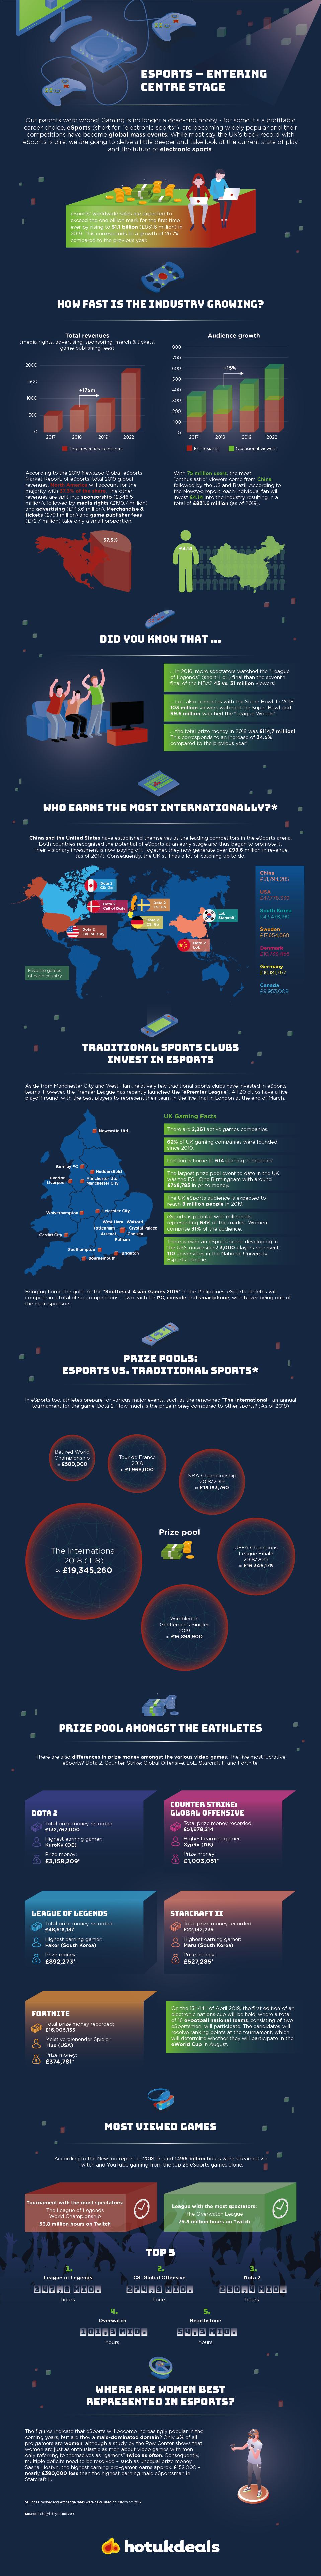 eSports - Entering center stage